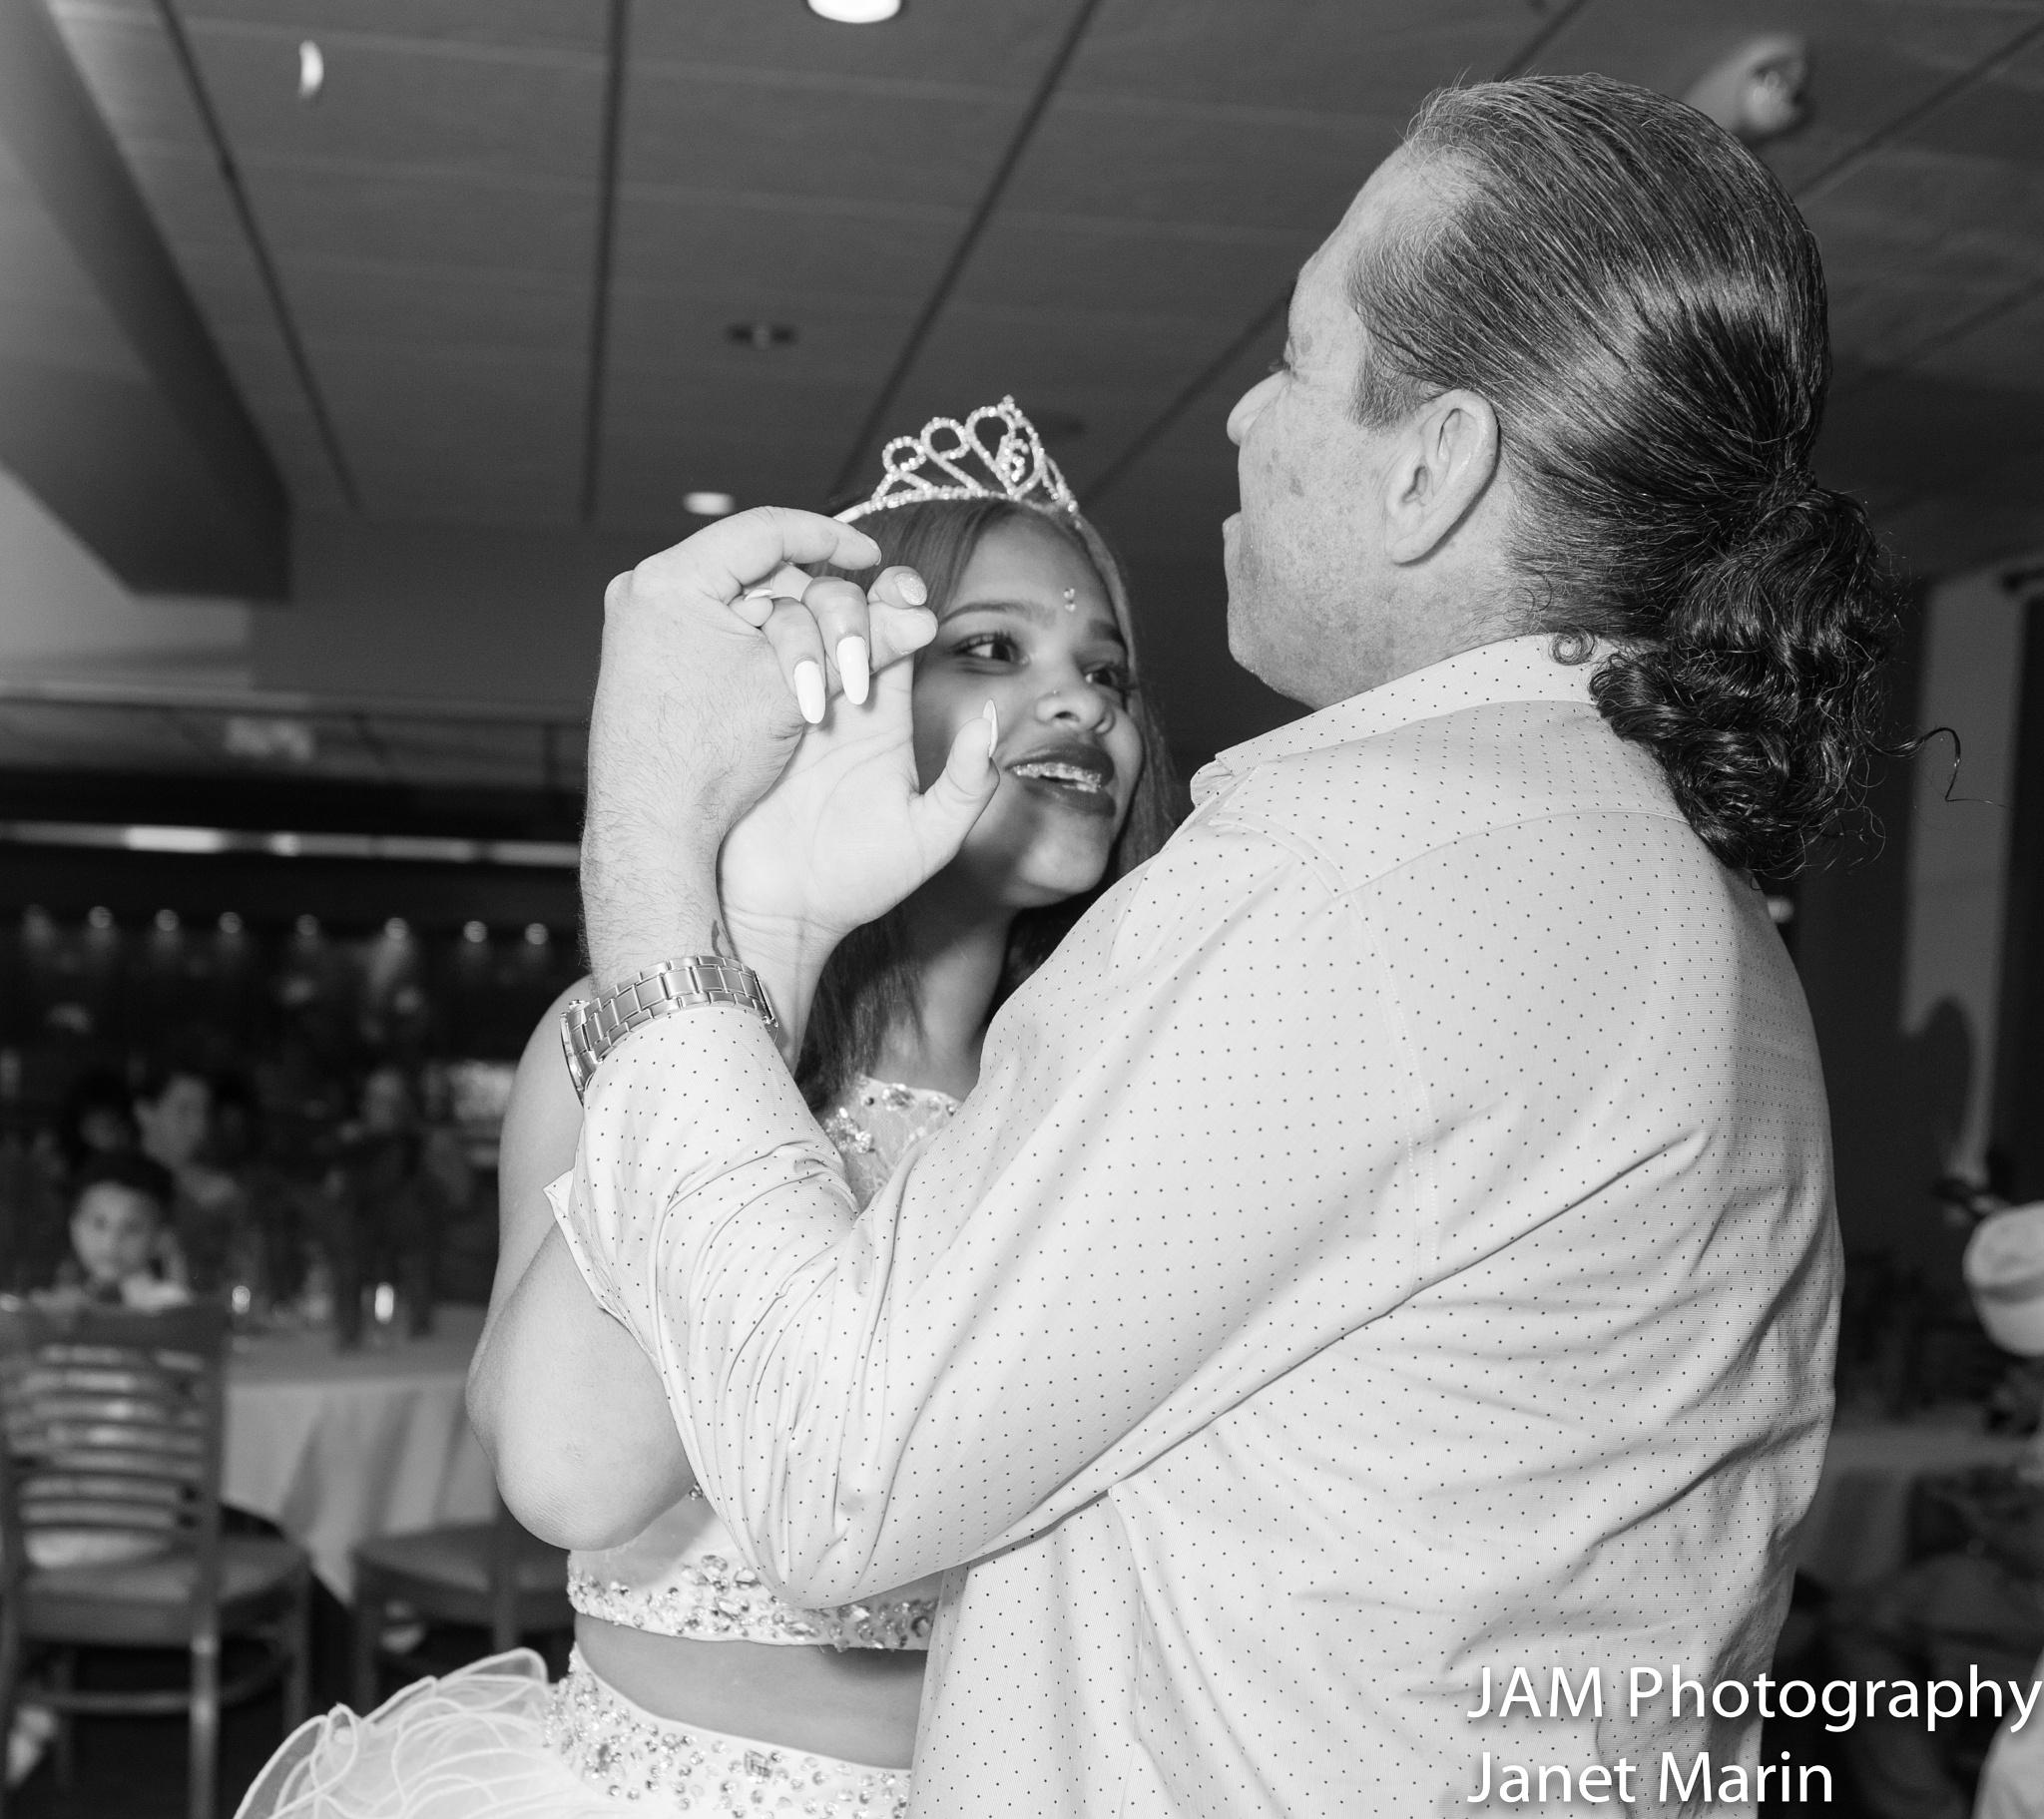 1st Dance w/grandpapa by Janet Marin